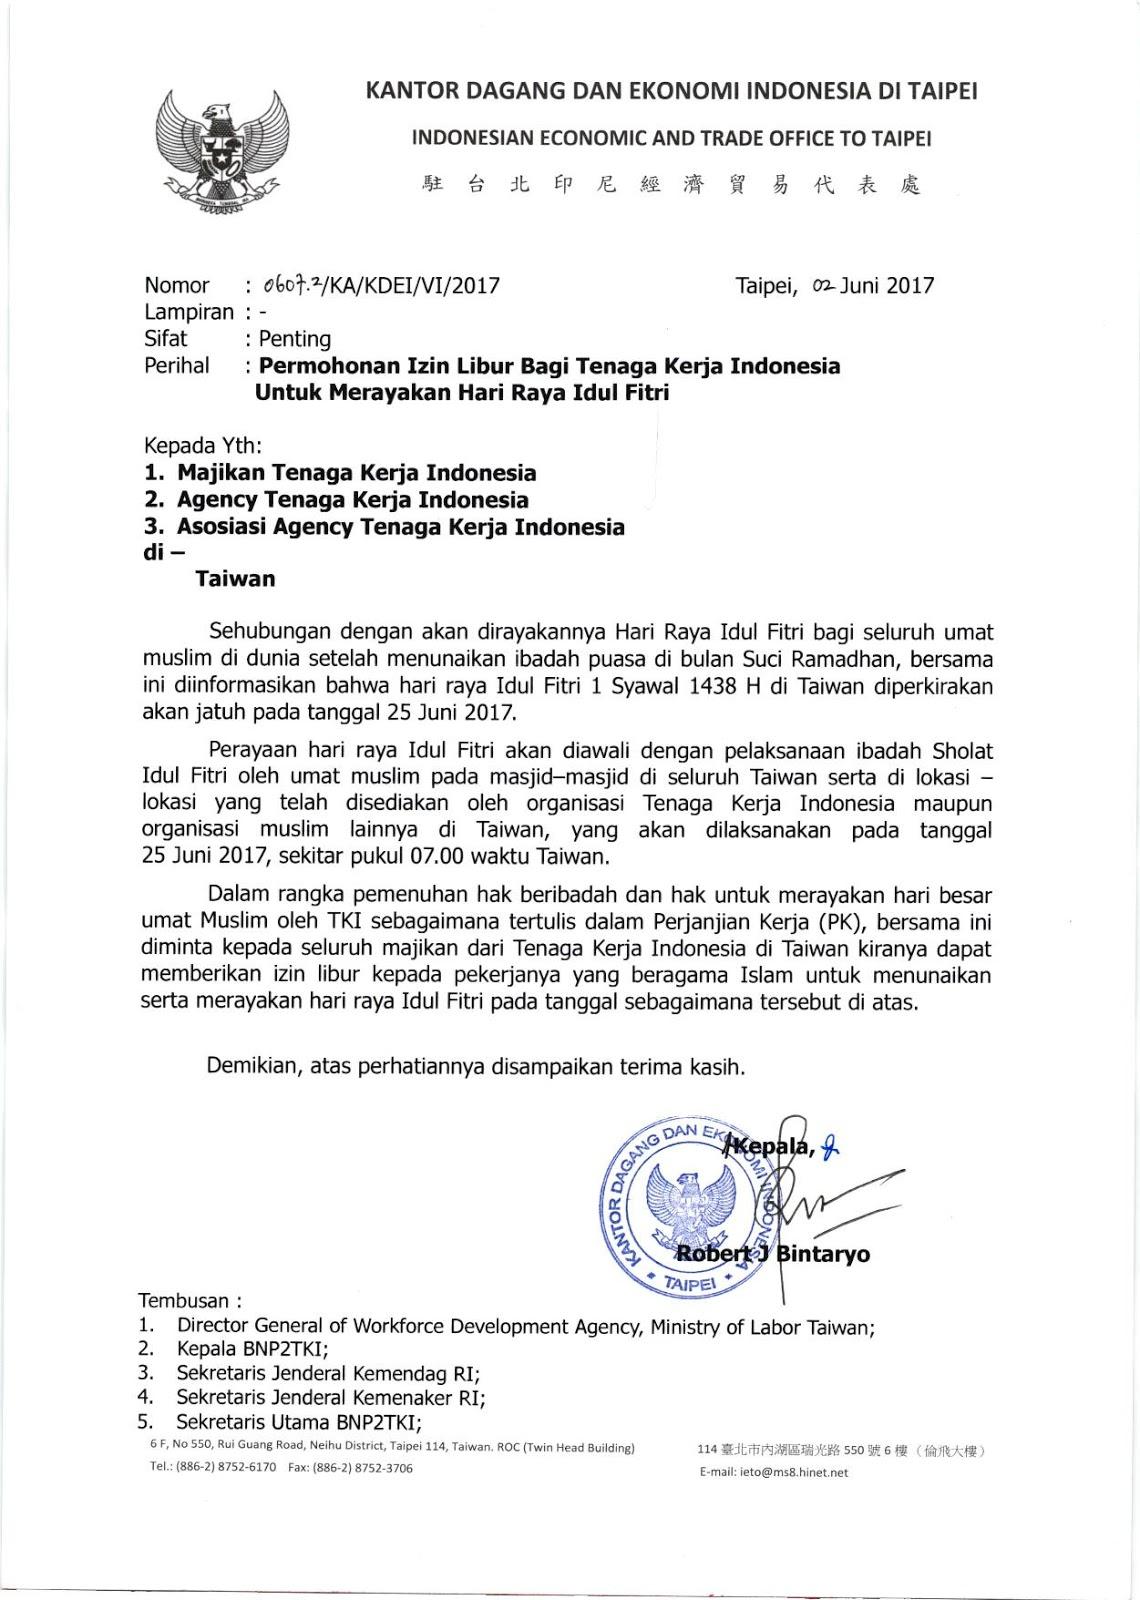 Surat Izin Libur TKI untuk Merayakan Hari Raya Idul Fitri